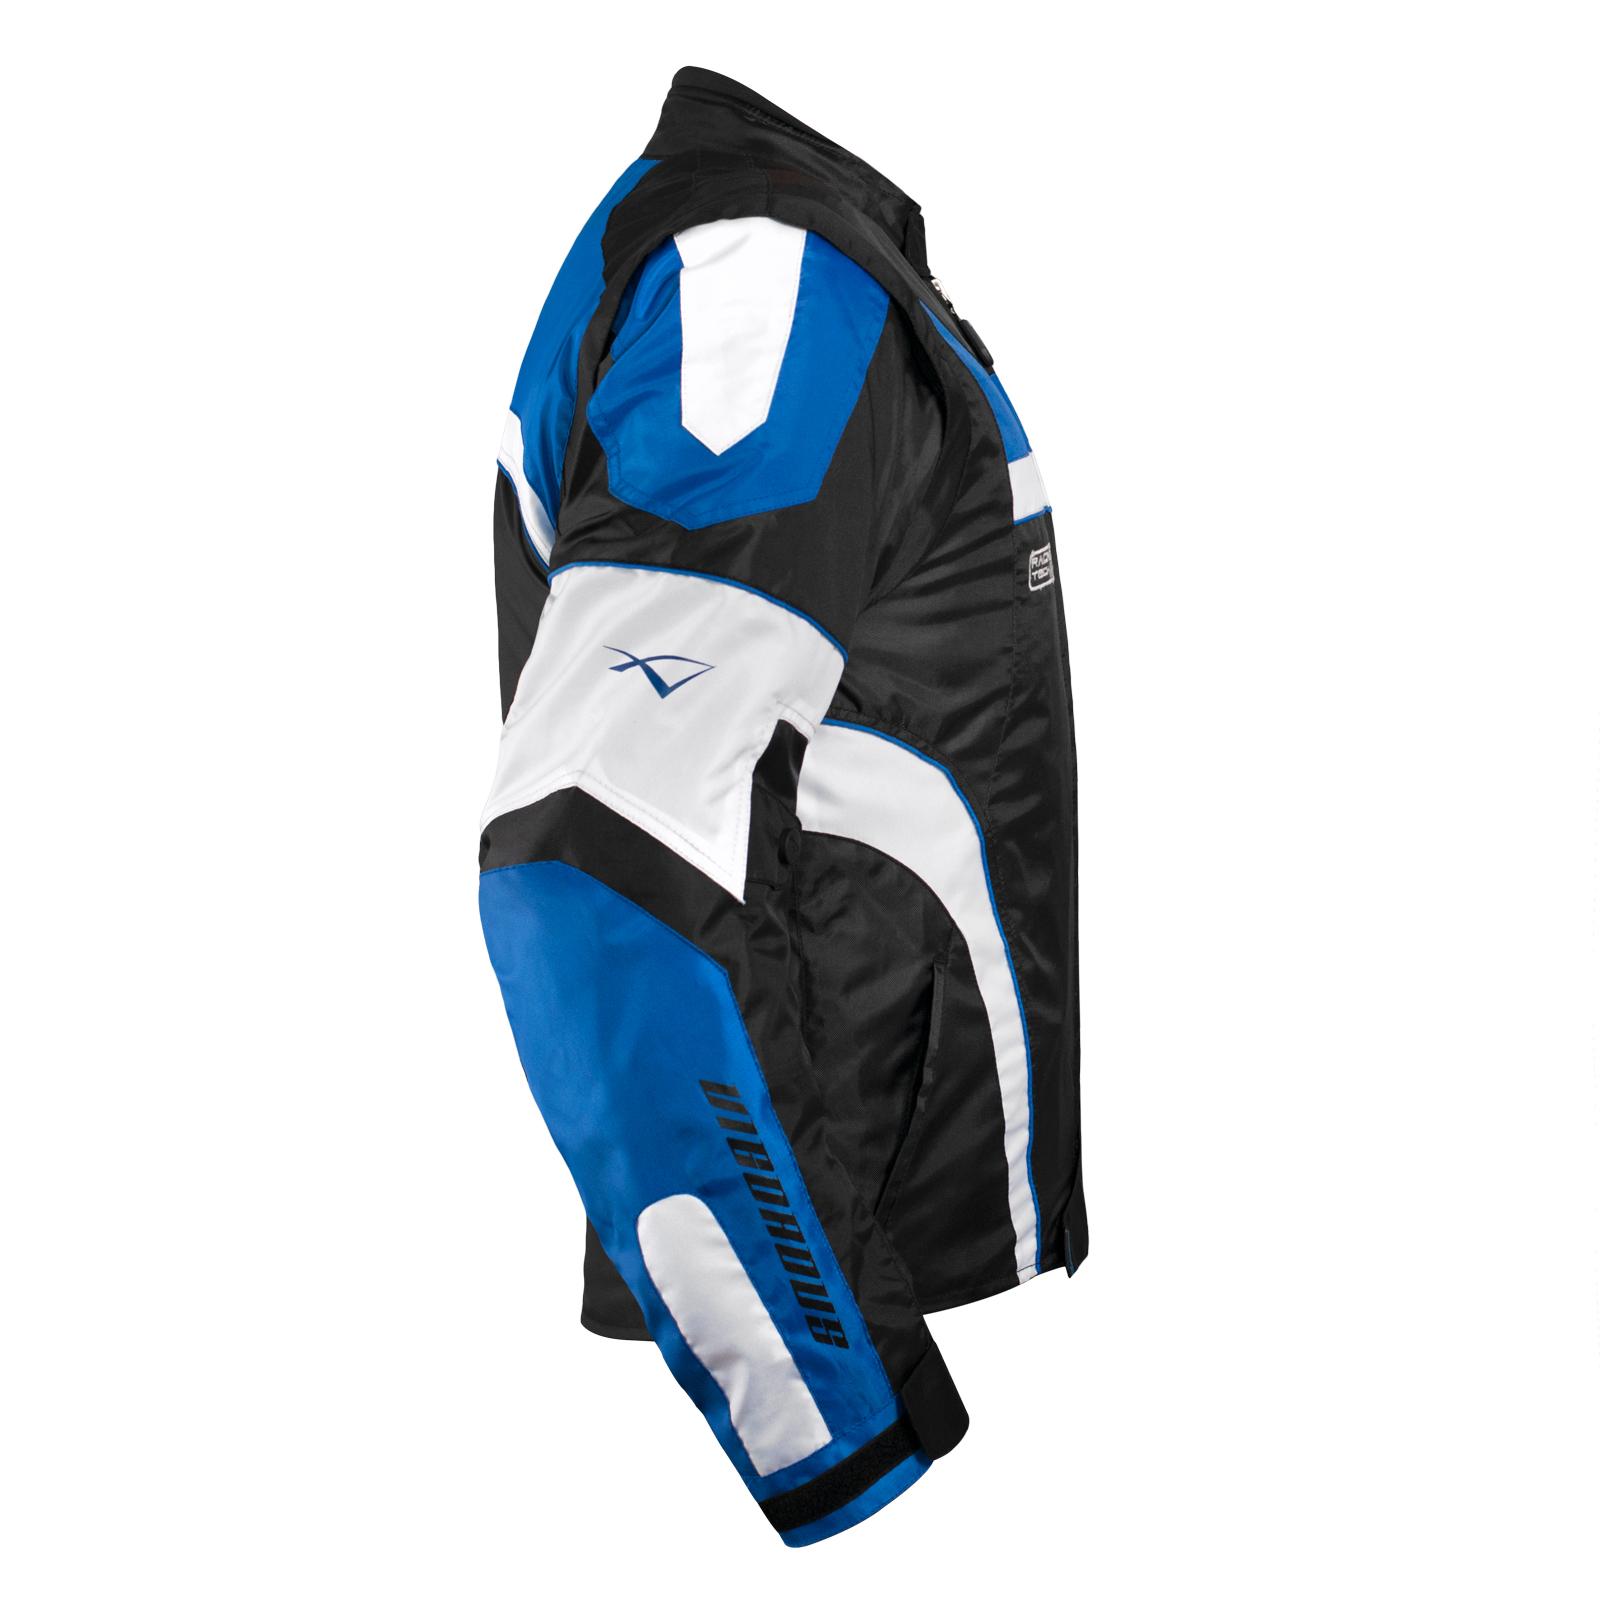 miniatuur 12 - Giacca Moto Manica Staccabile Tessuto Protezioni CE Sfoderabile Gilet Termico